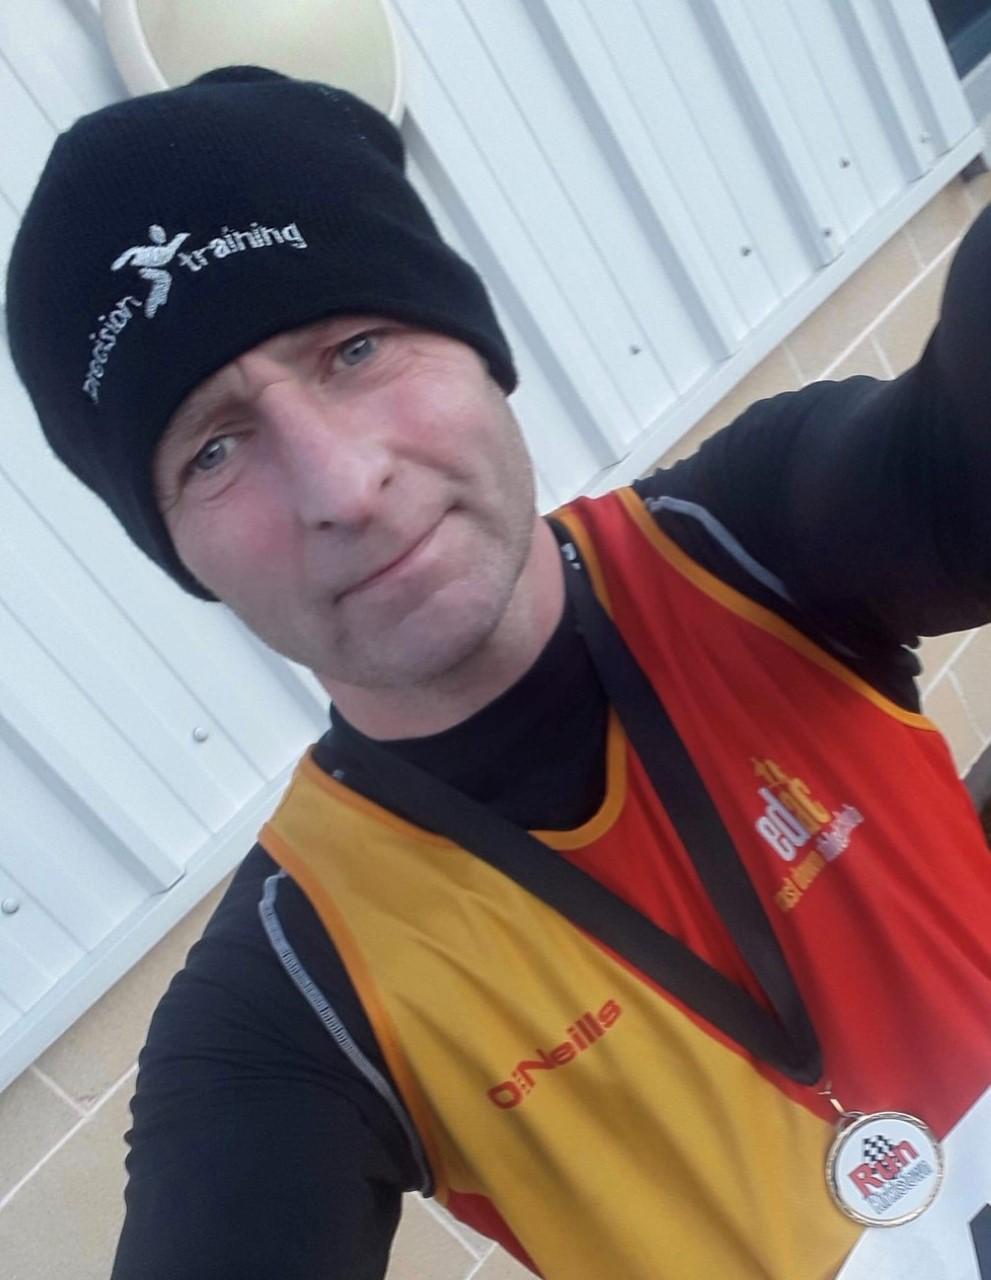 0908c8eae58 Paul Lloyd wearing his Run Kirkistown medal - 2nd in the Half Marathon